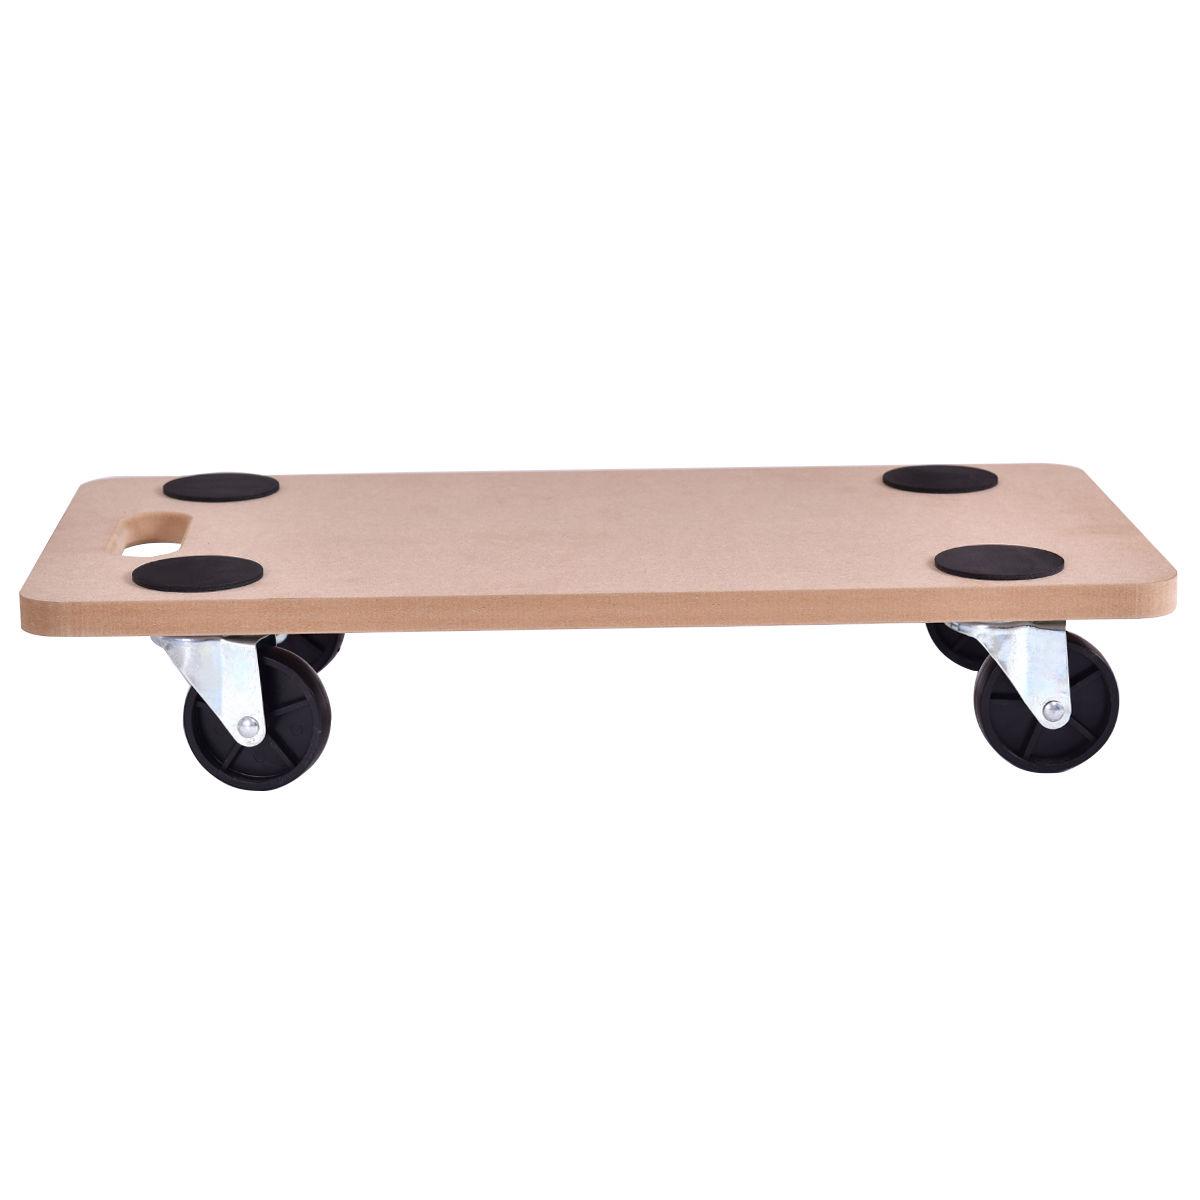 440 lbs Platform Dolly Rectangle Wood Utility Cart